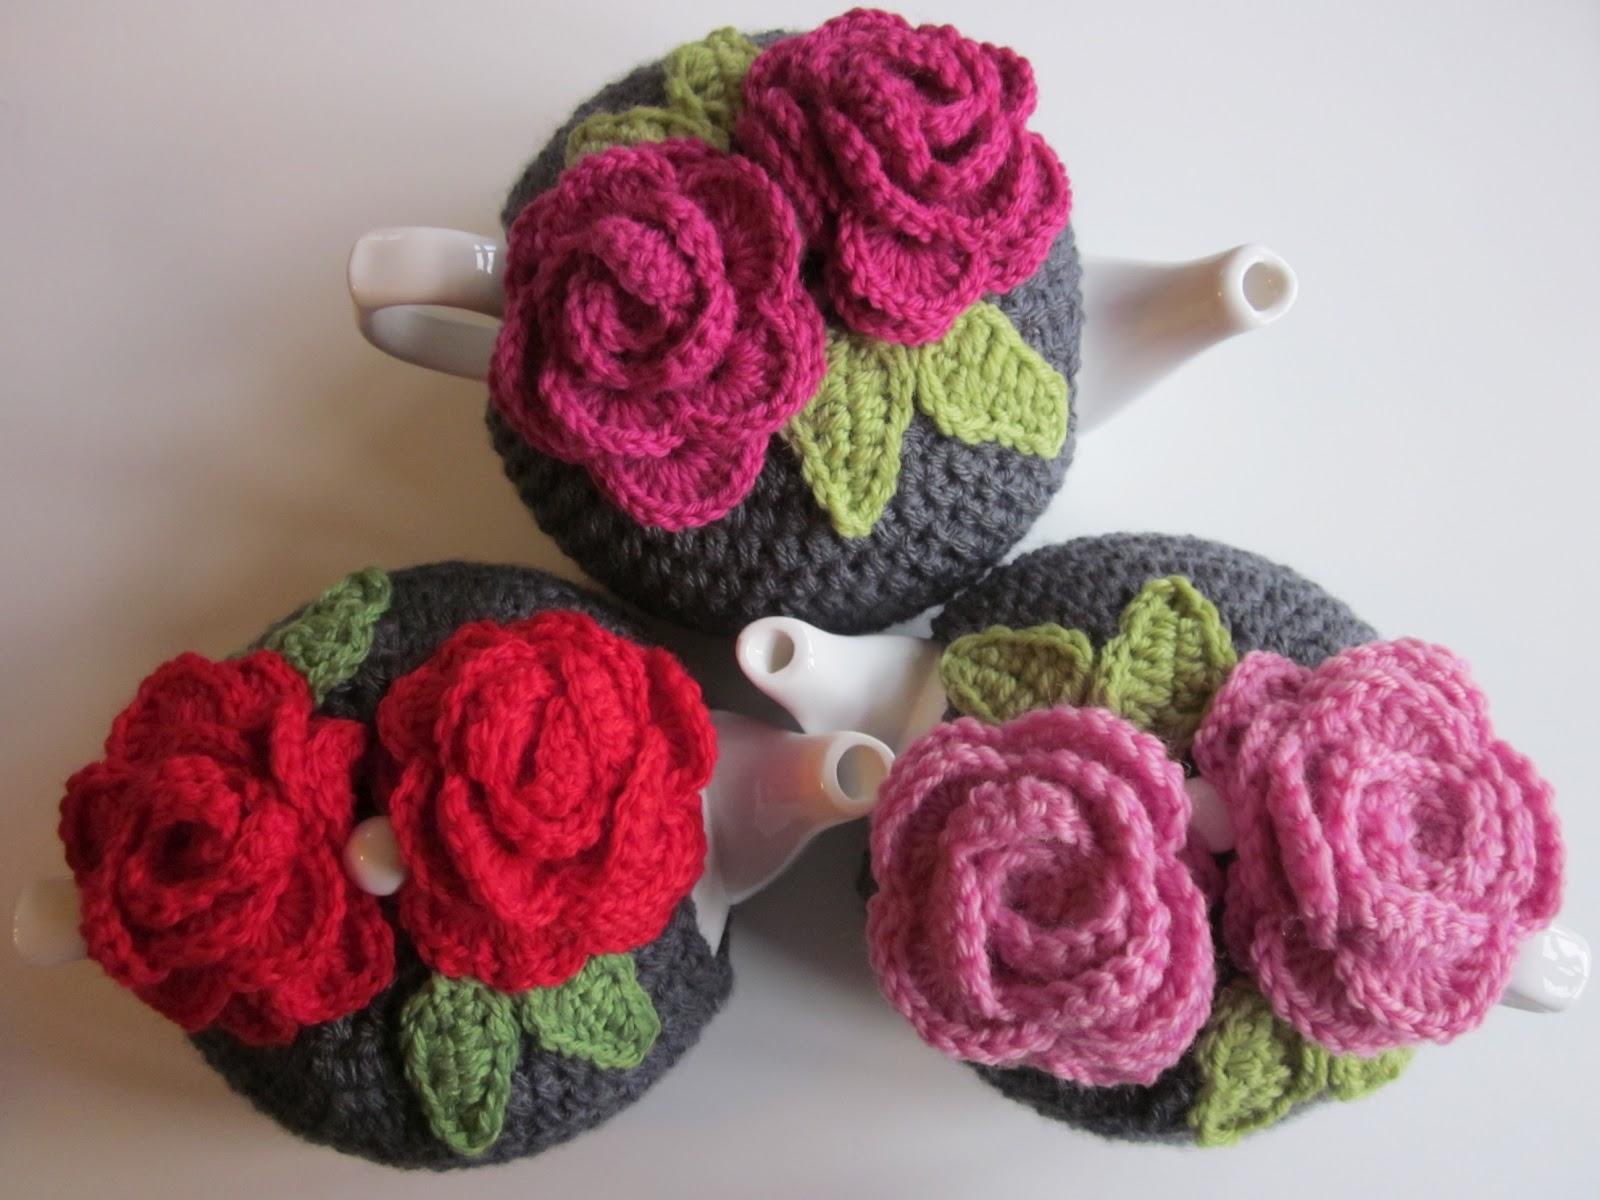 tea cosy template - tea cosies on pinterest tea cozy knitted tea cosies and